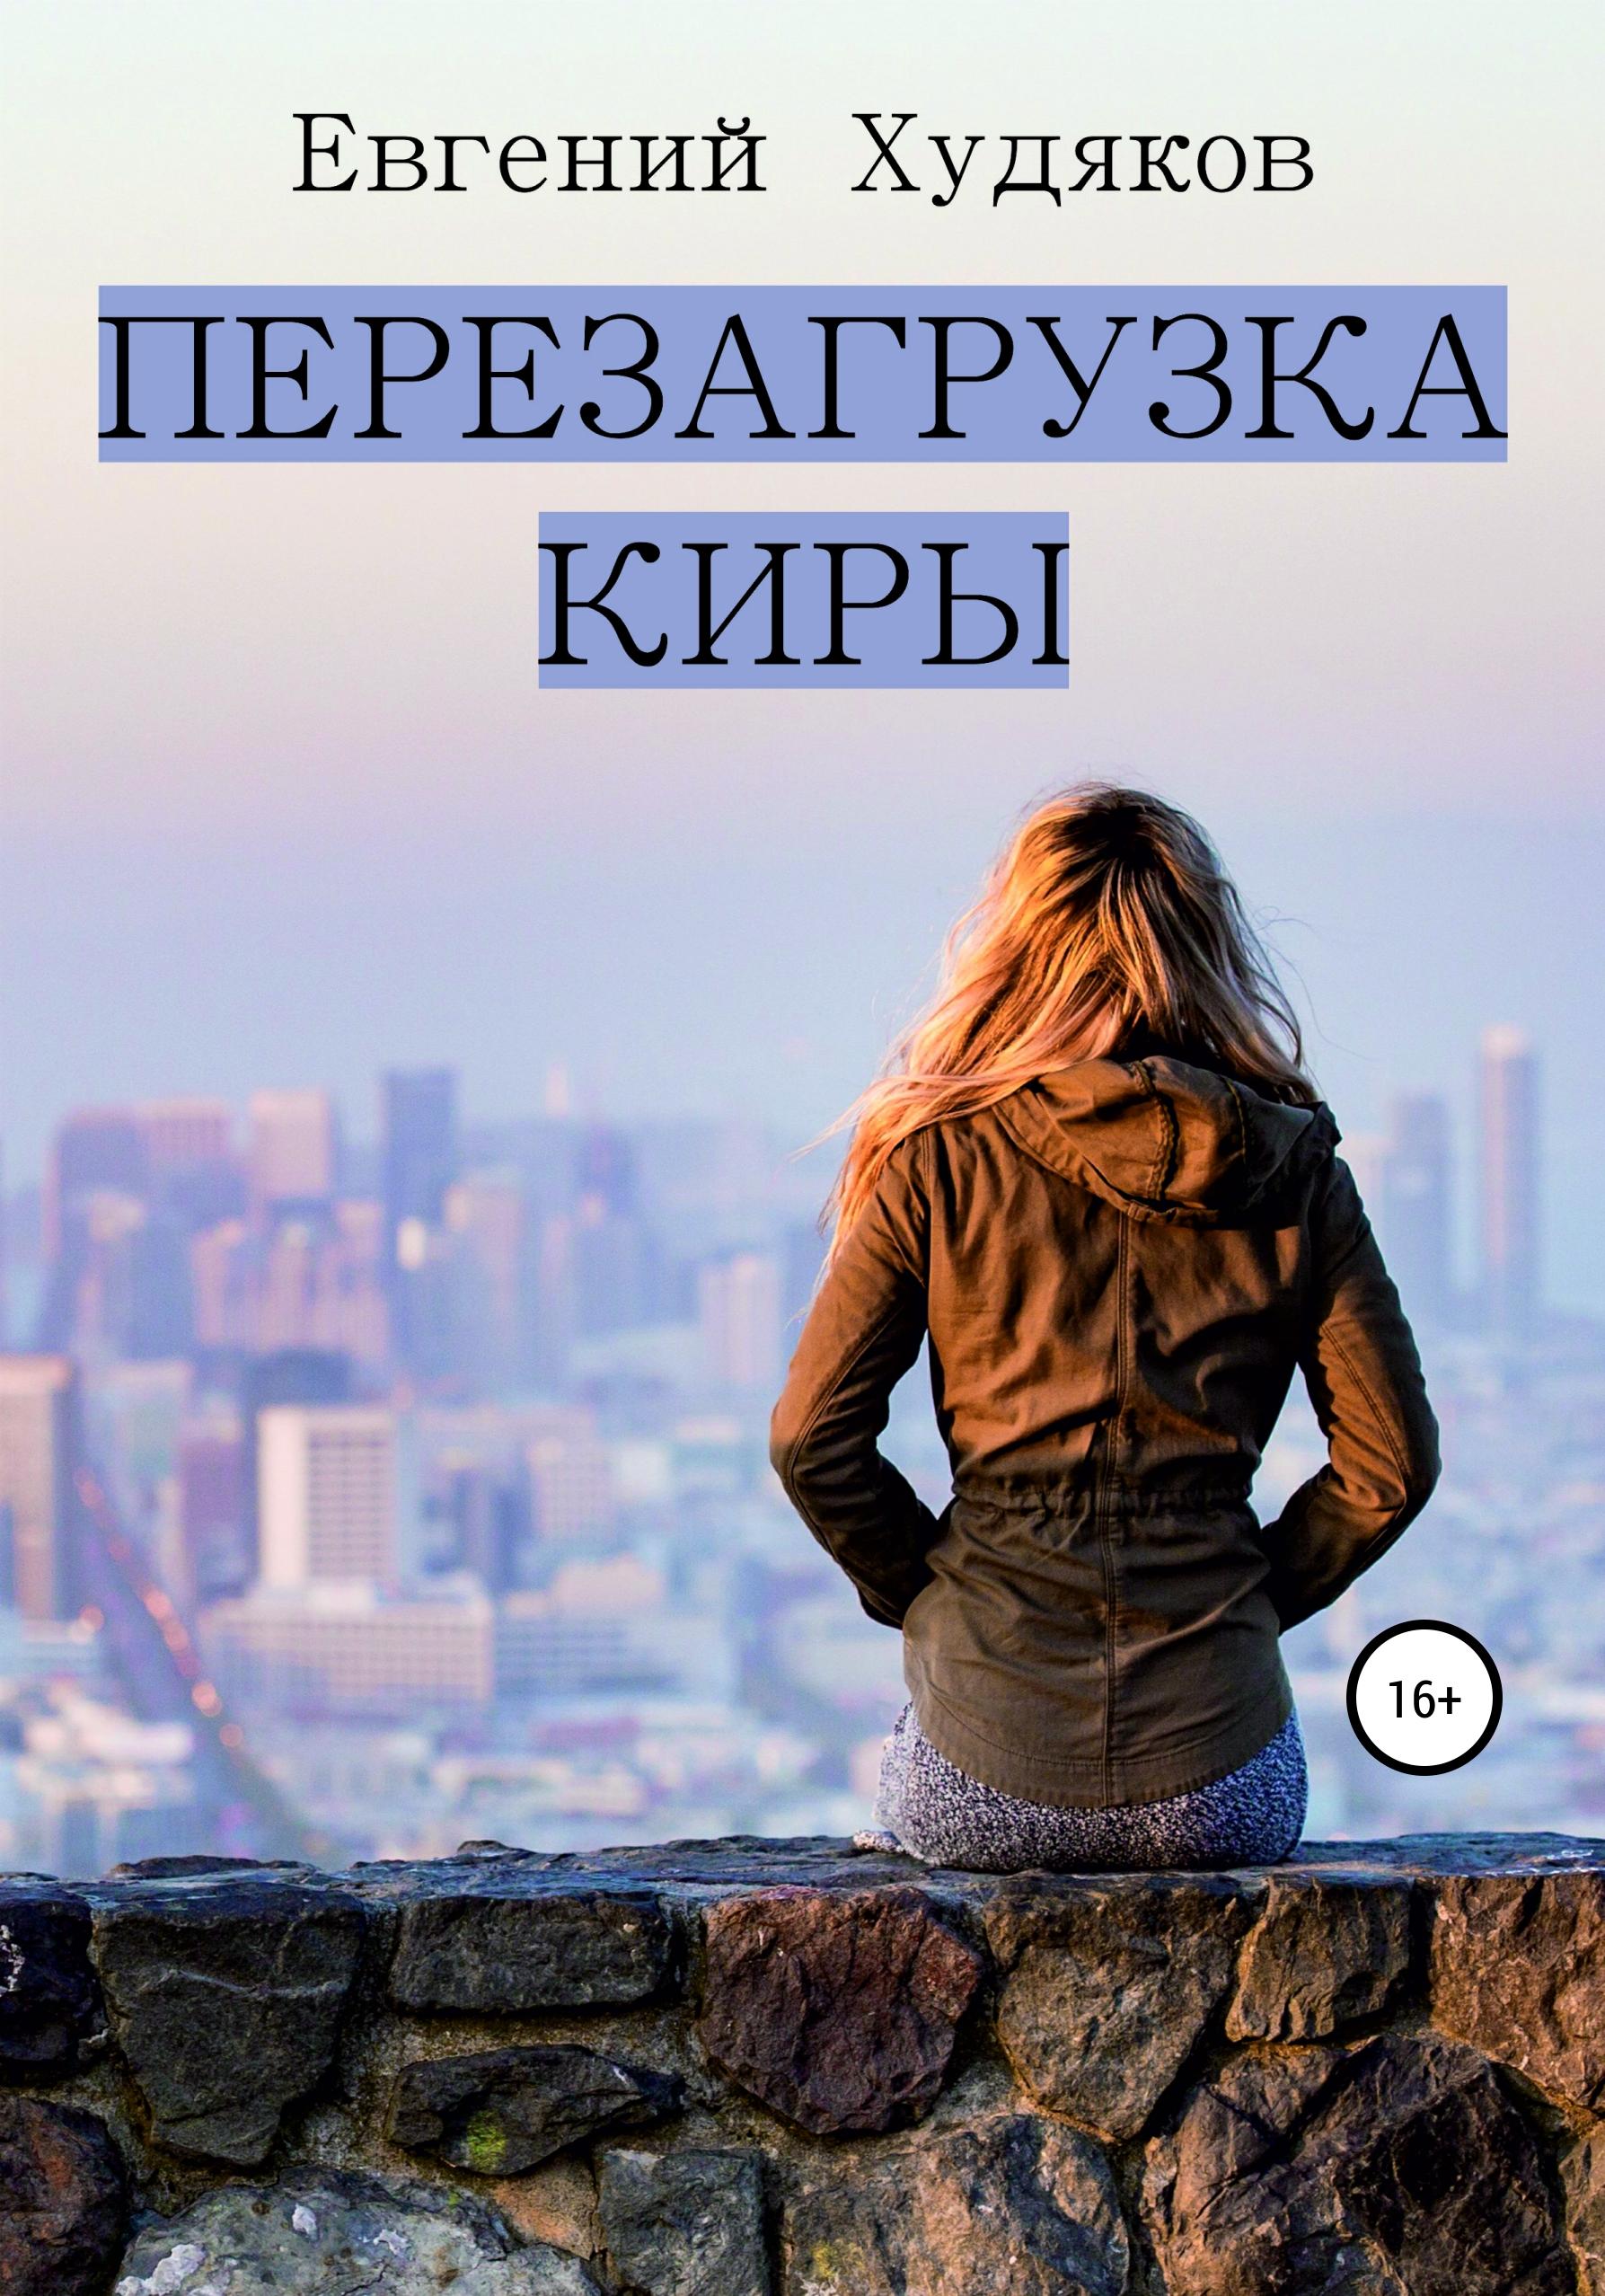 Евгений Худяков Перезагрузка Киры вигор косметика сайт москва